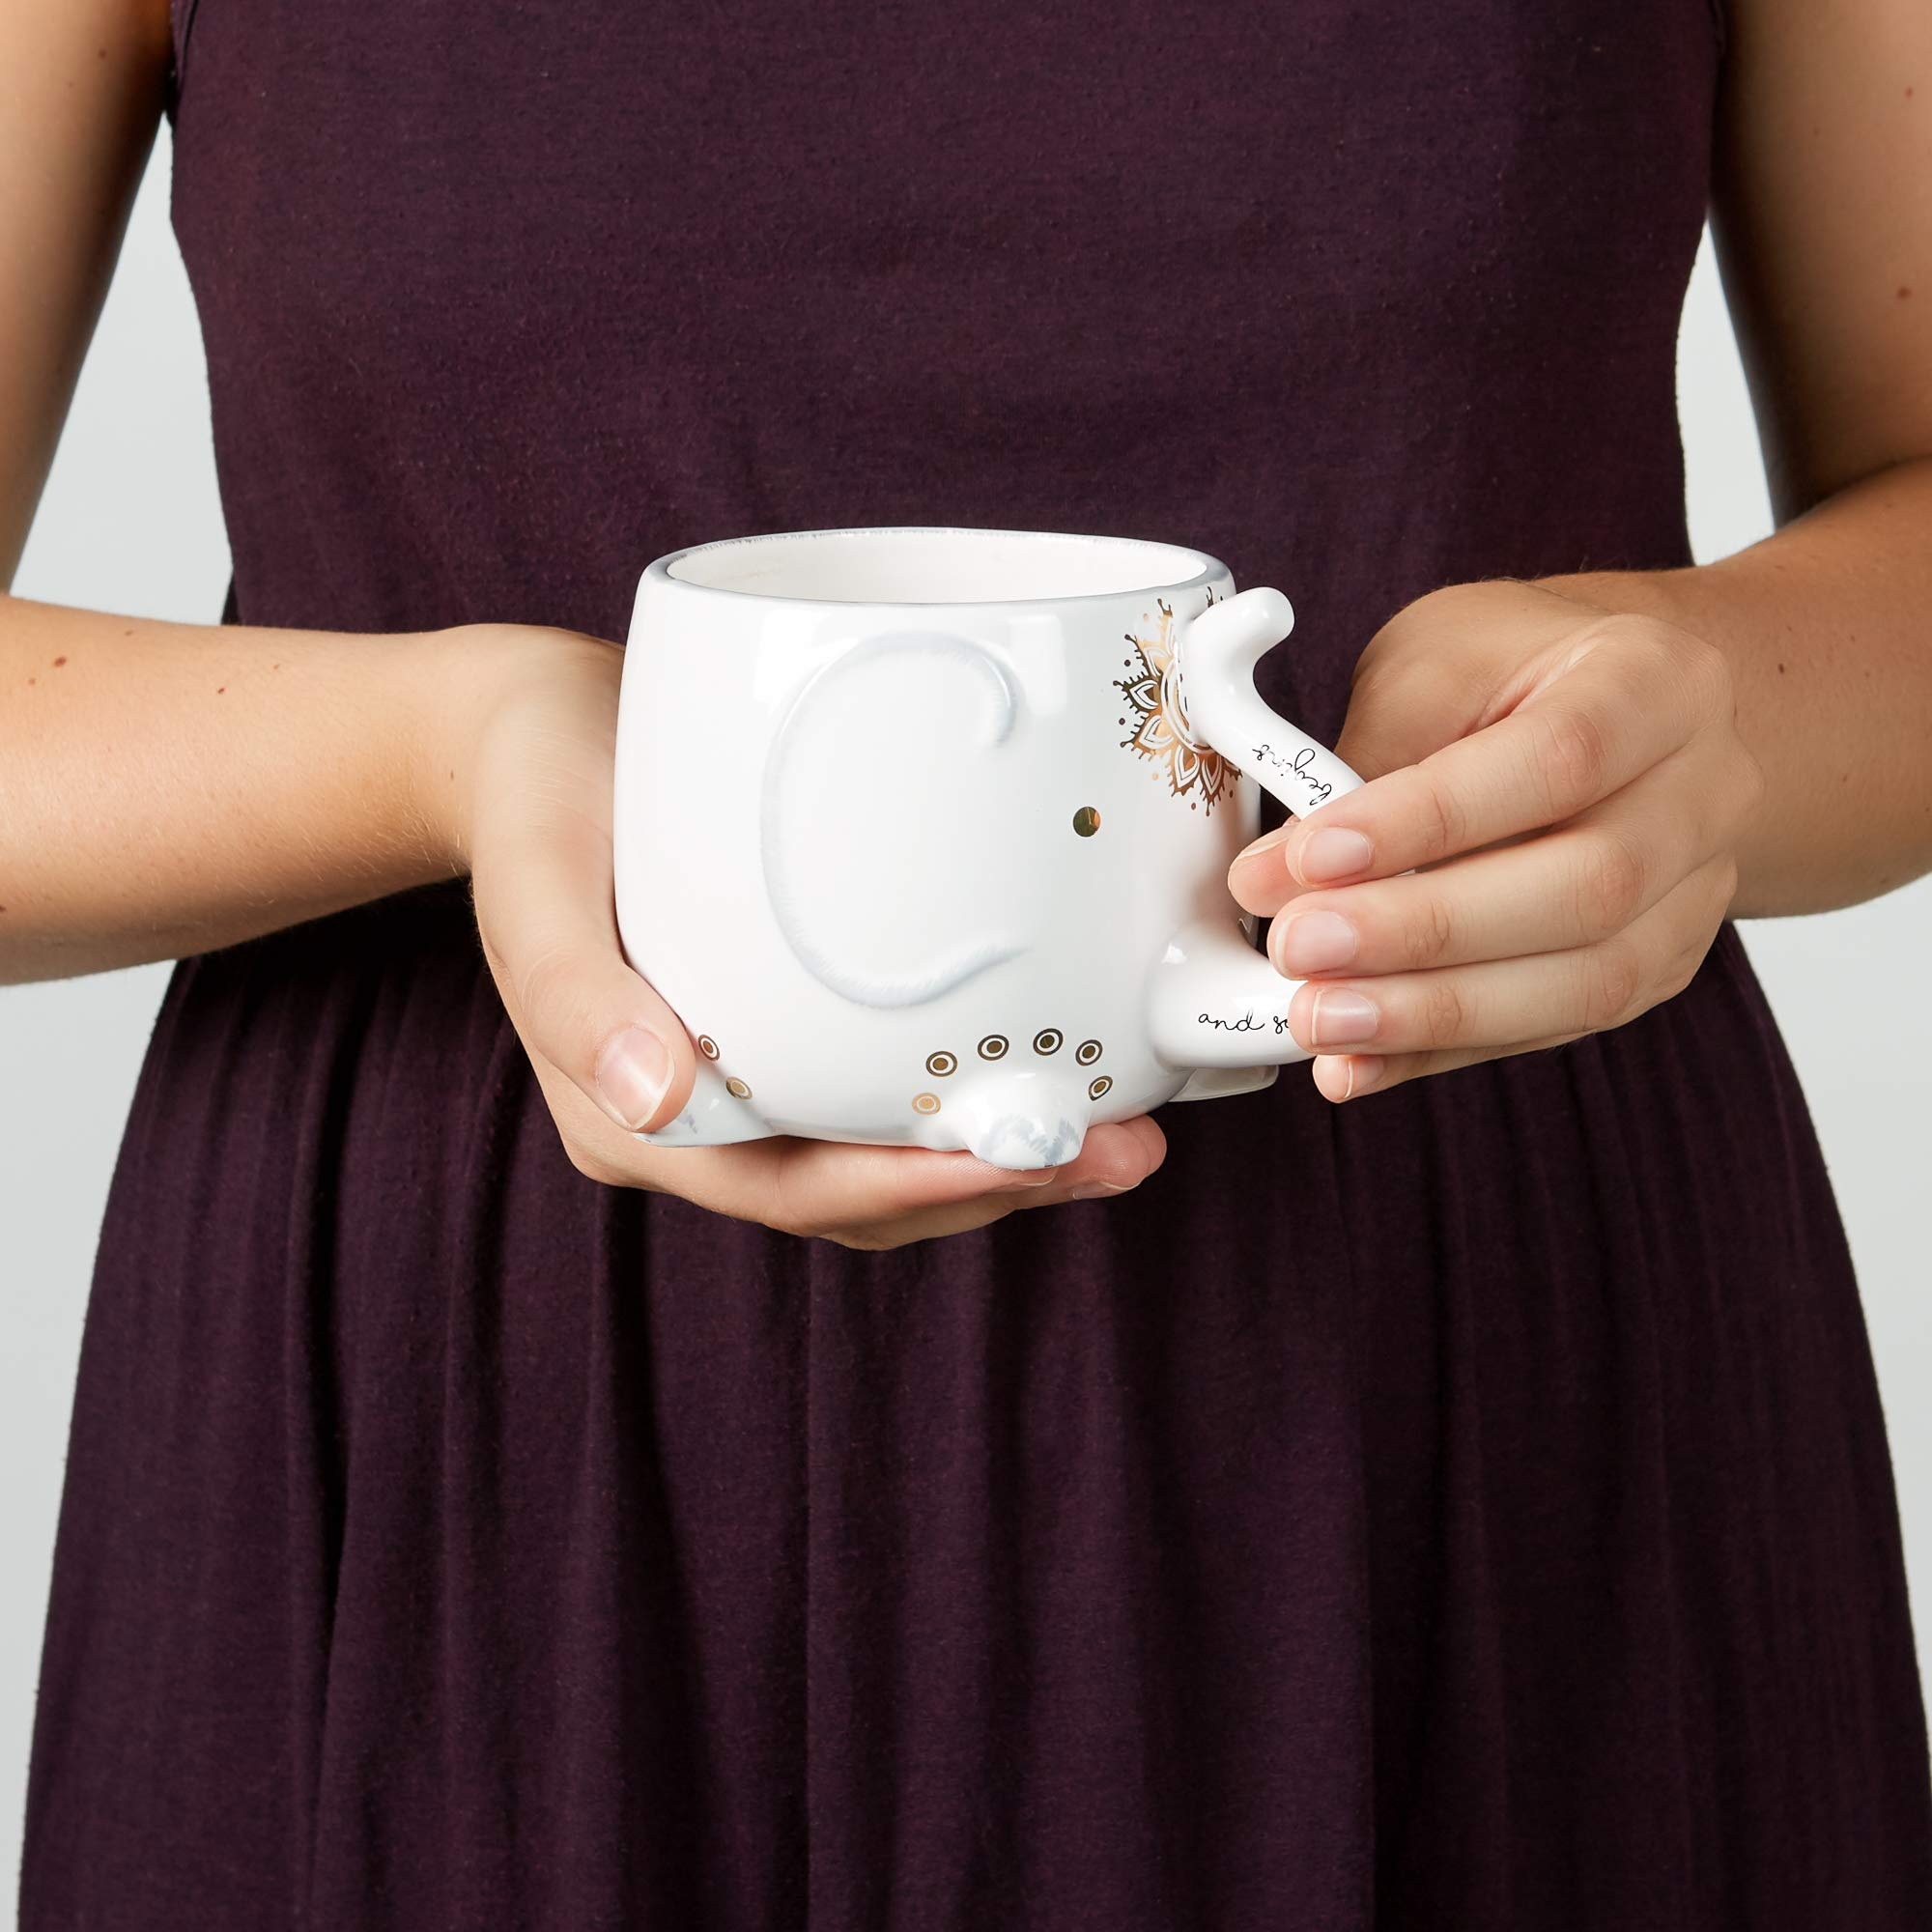 White Ceramic Coffee or Tea Mugs: Tri-Coastal Design Soho Boho Elephant Coffee Mug with Gold Foil Details, Fun Trunk Handle and Printed Saying - 18.6 Fluid Ounce Large, Cute Handmade Cup by Tri-coastal Design (Image #5)